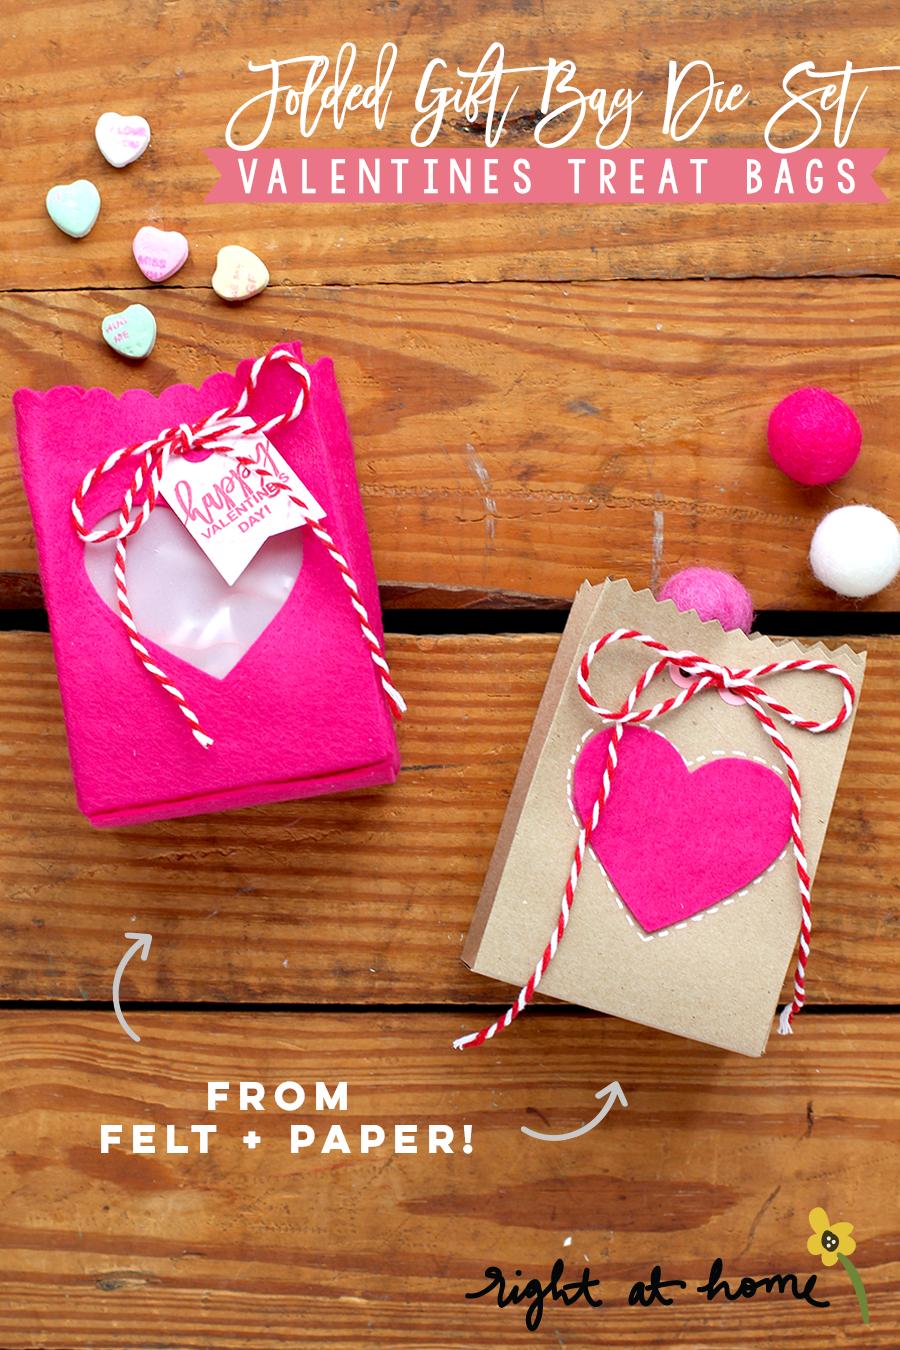 Day #2: Folded Gift Bag Die Set Felt + Paper Valentines Treat Bags // rightathomeshop.com/blog